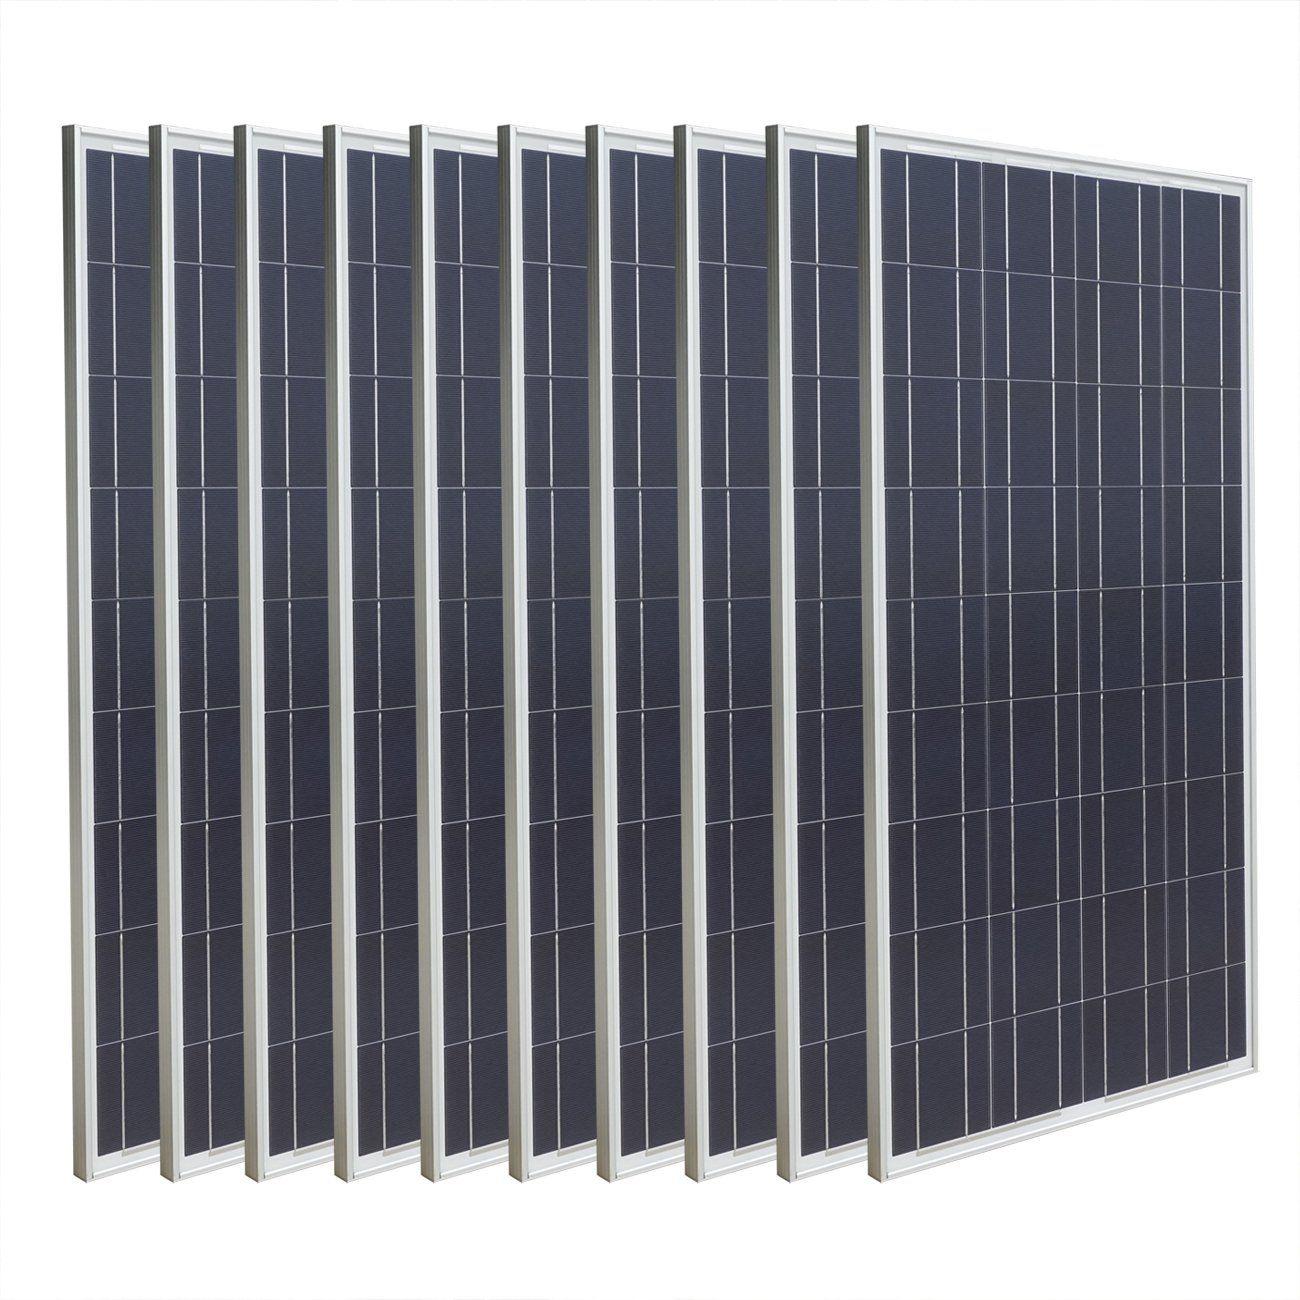 Eco Worthy 1kw 10pcs 100 Watts 12 Volts Polycrystalline Pv Solar Panels Eco Worthy 10pcs 12 Volt 100 Watt High Ef Solar Panels Solar Panel Cost Solar Pv Panel